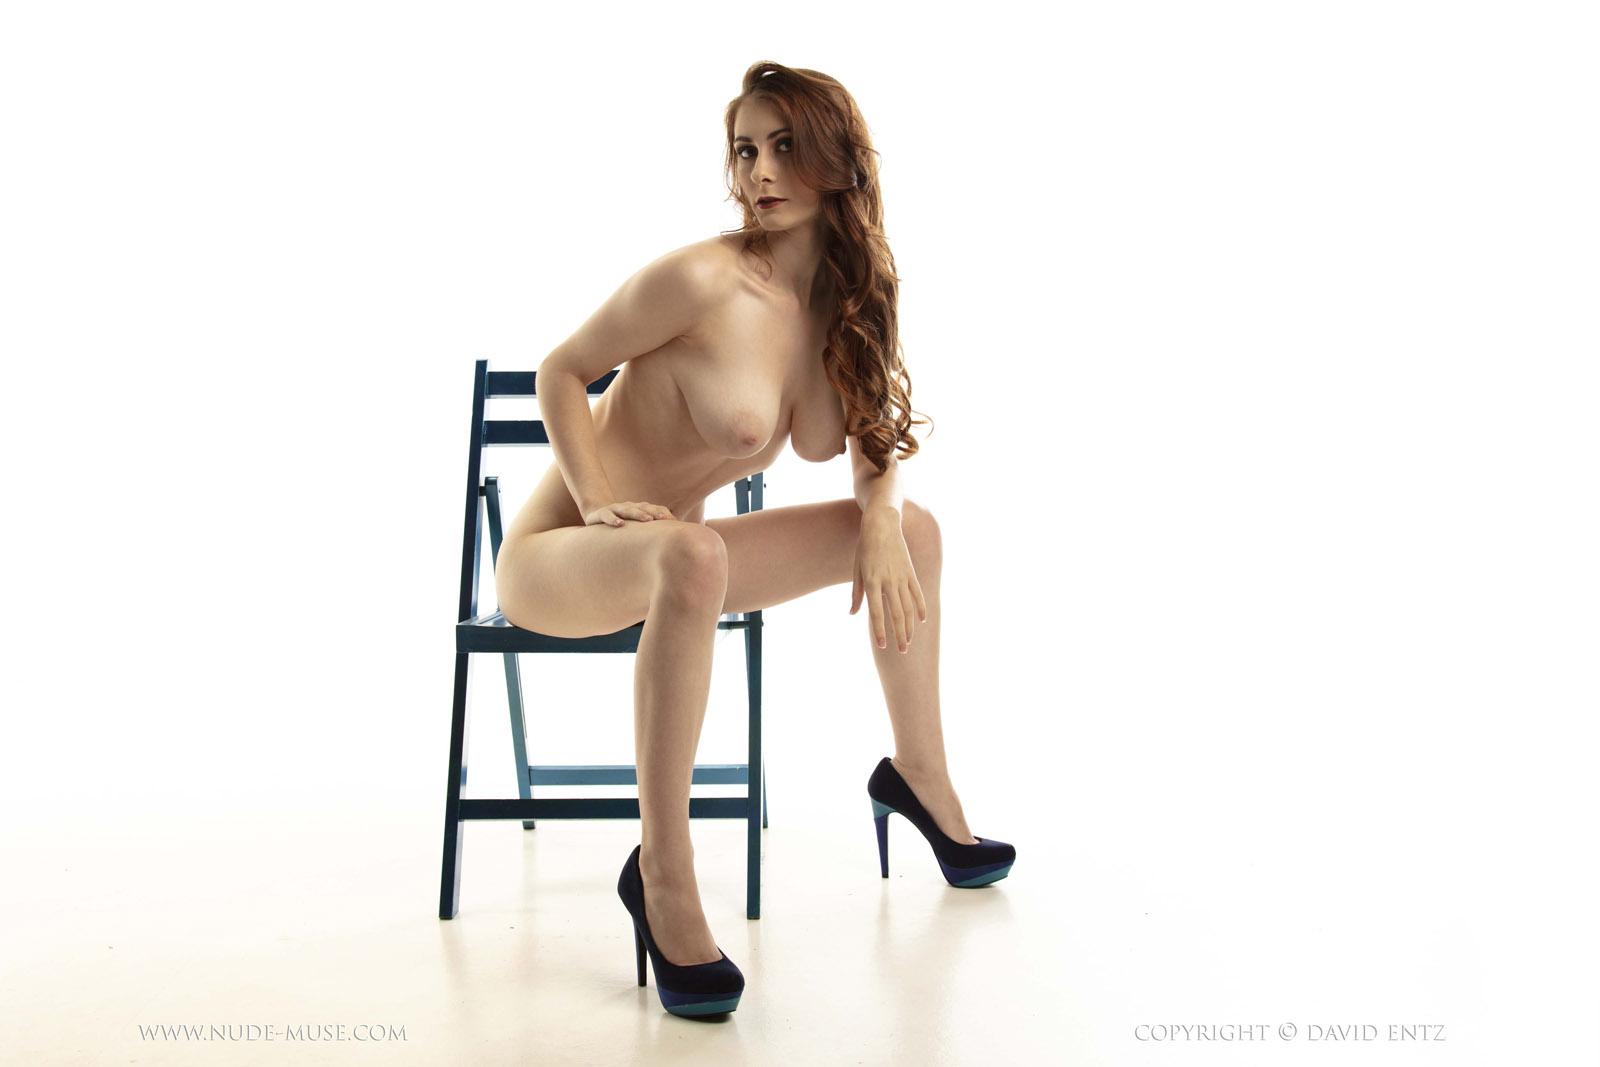 Amanda Blue Nude penni blue chair nude muse - curvy erotic